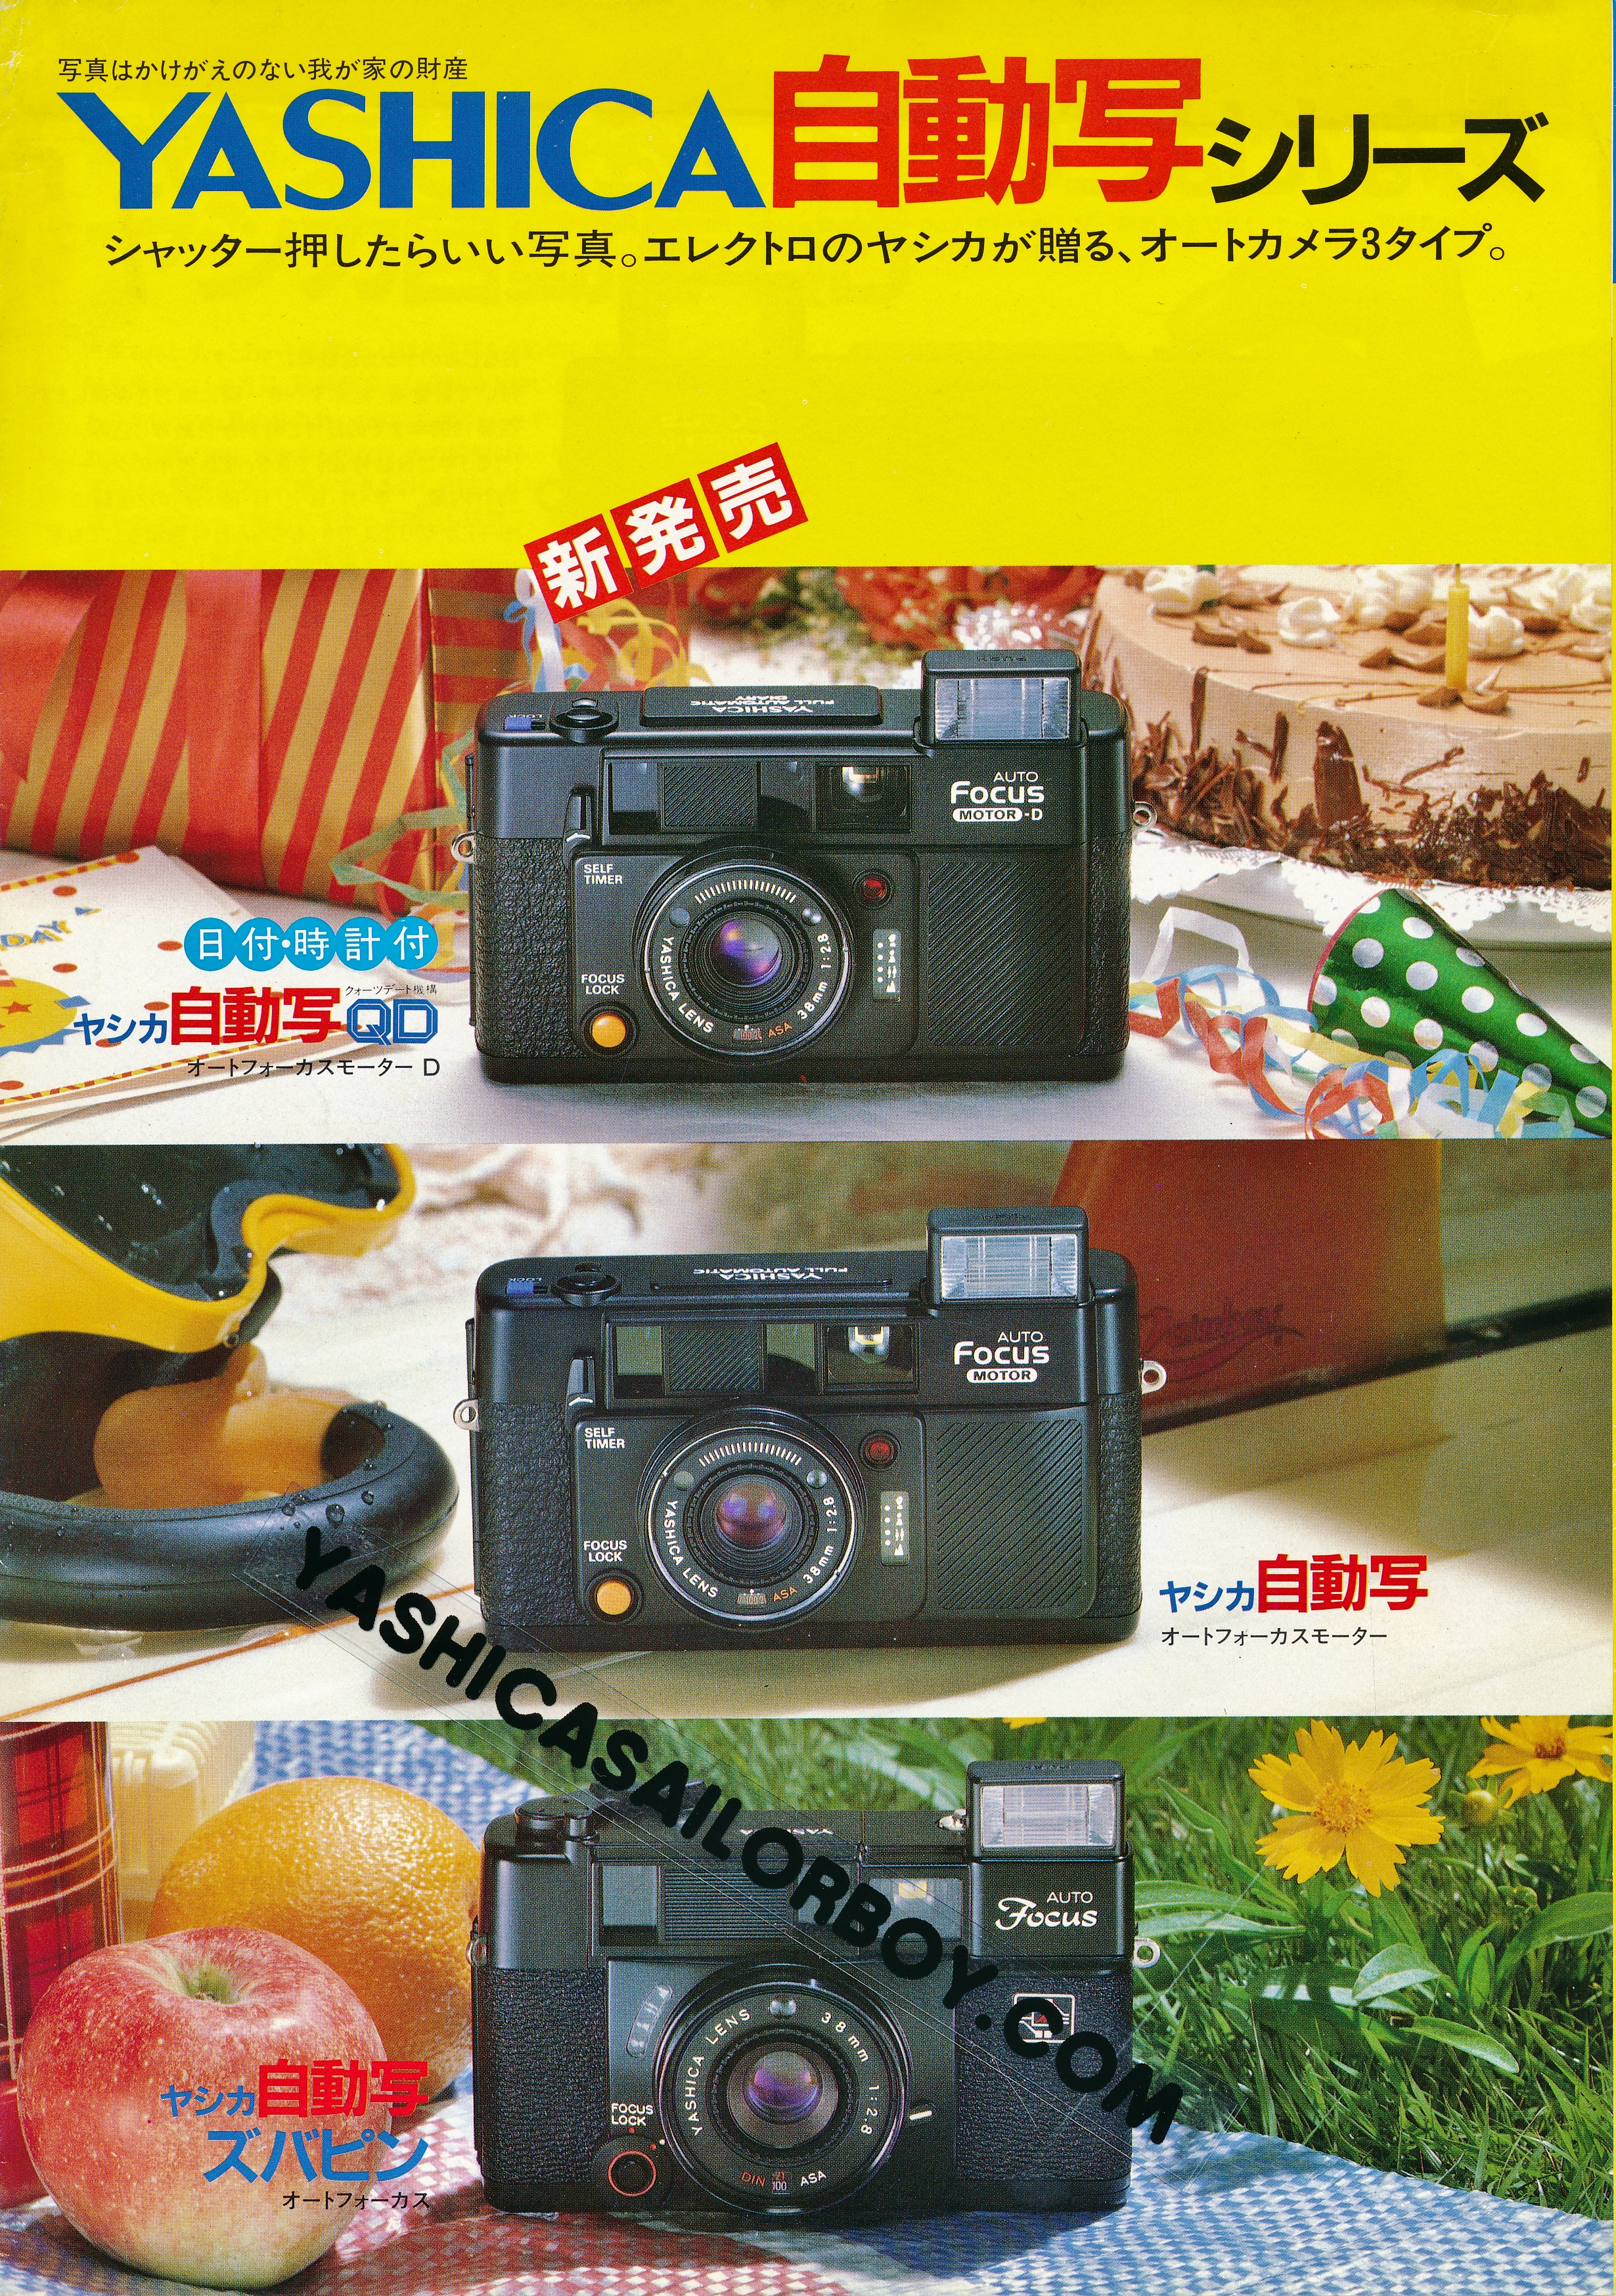 Yashica Auto Focus Brochure